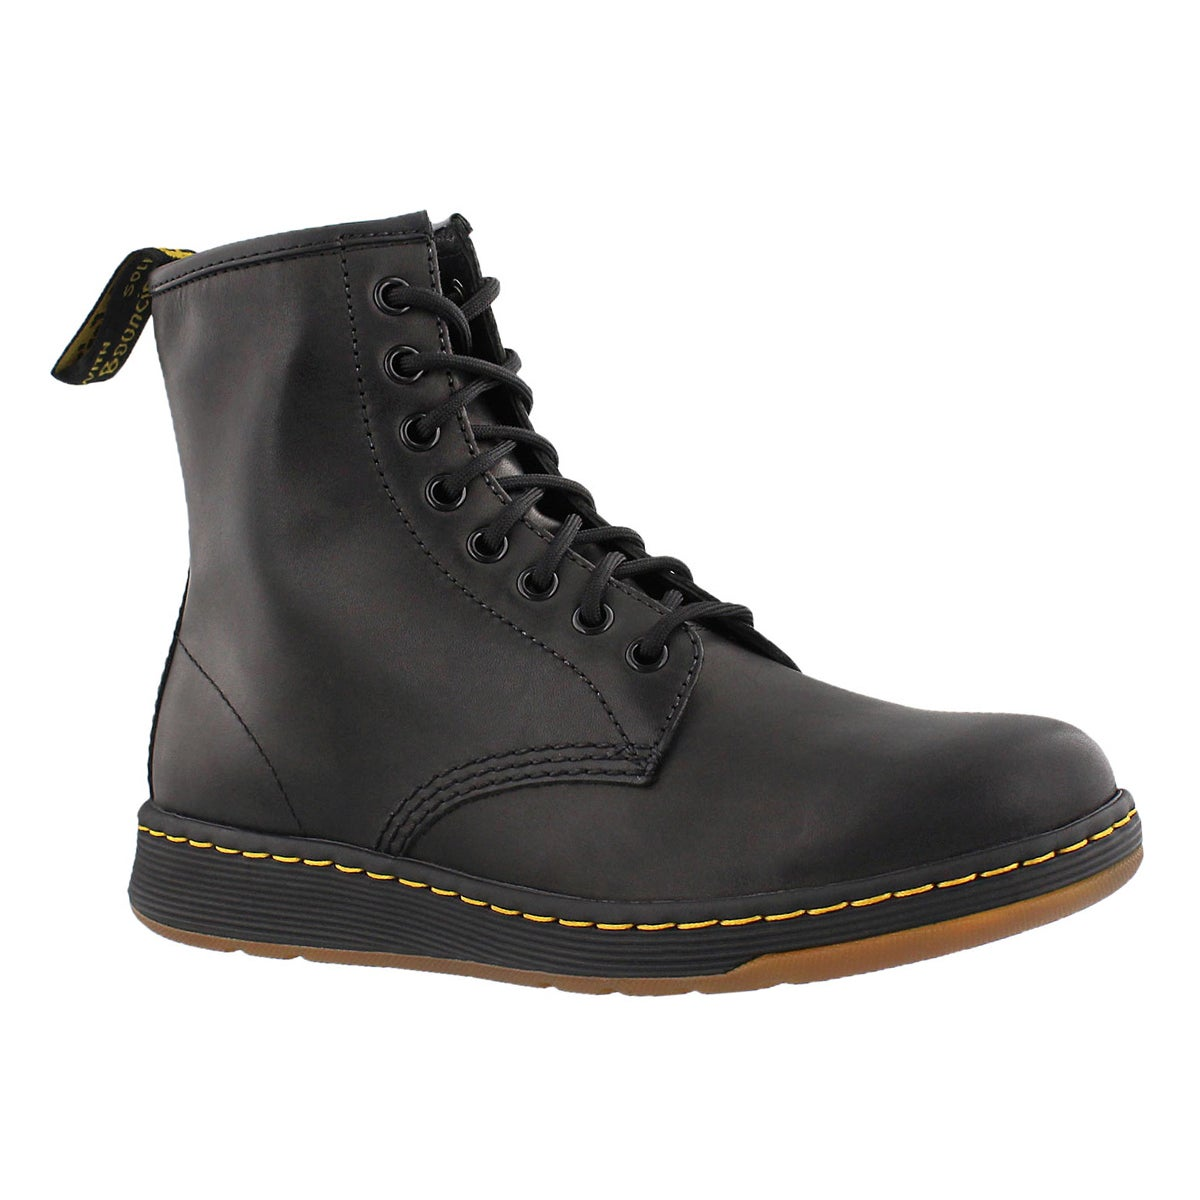 Women's DM Lite NEWTON black 8-eye combat boots